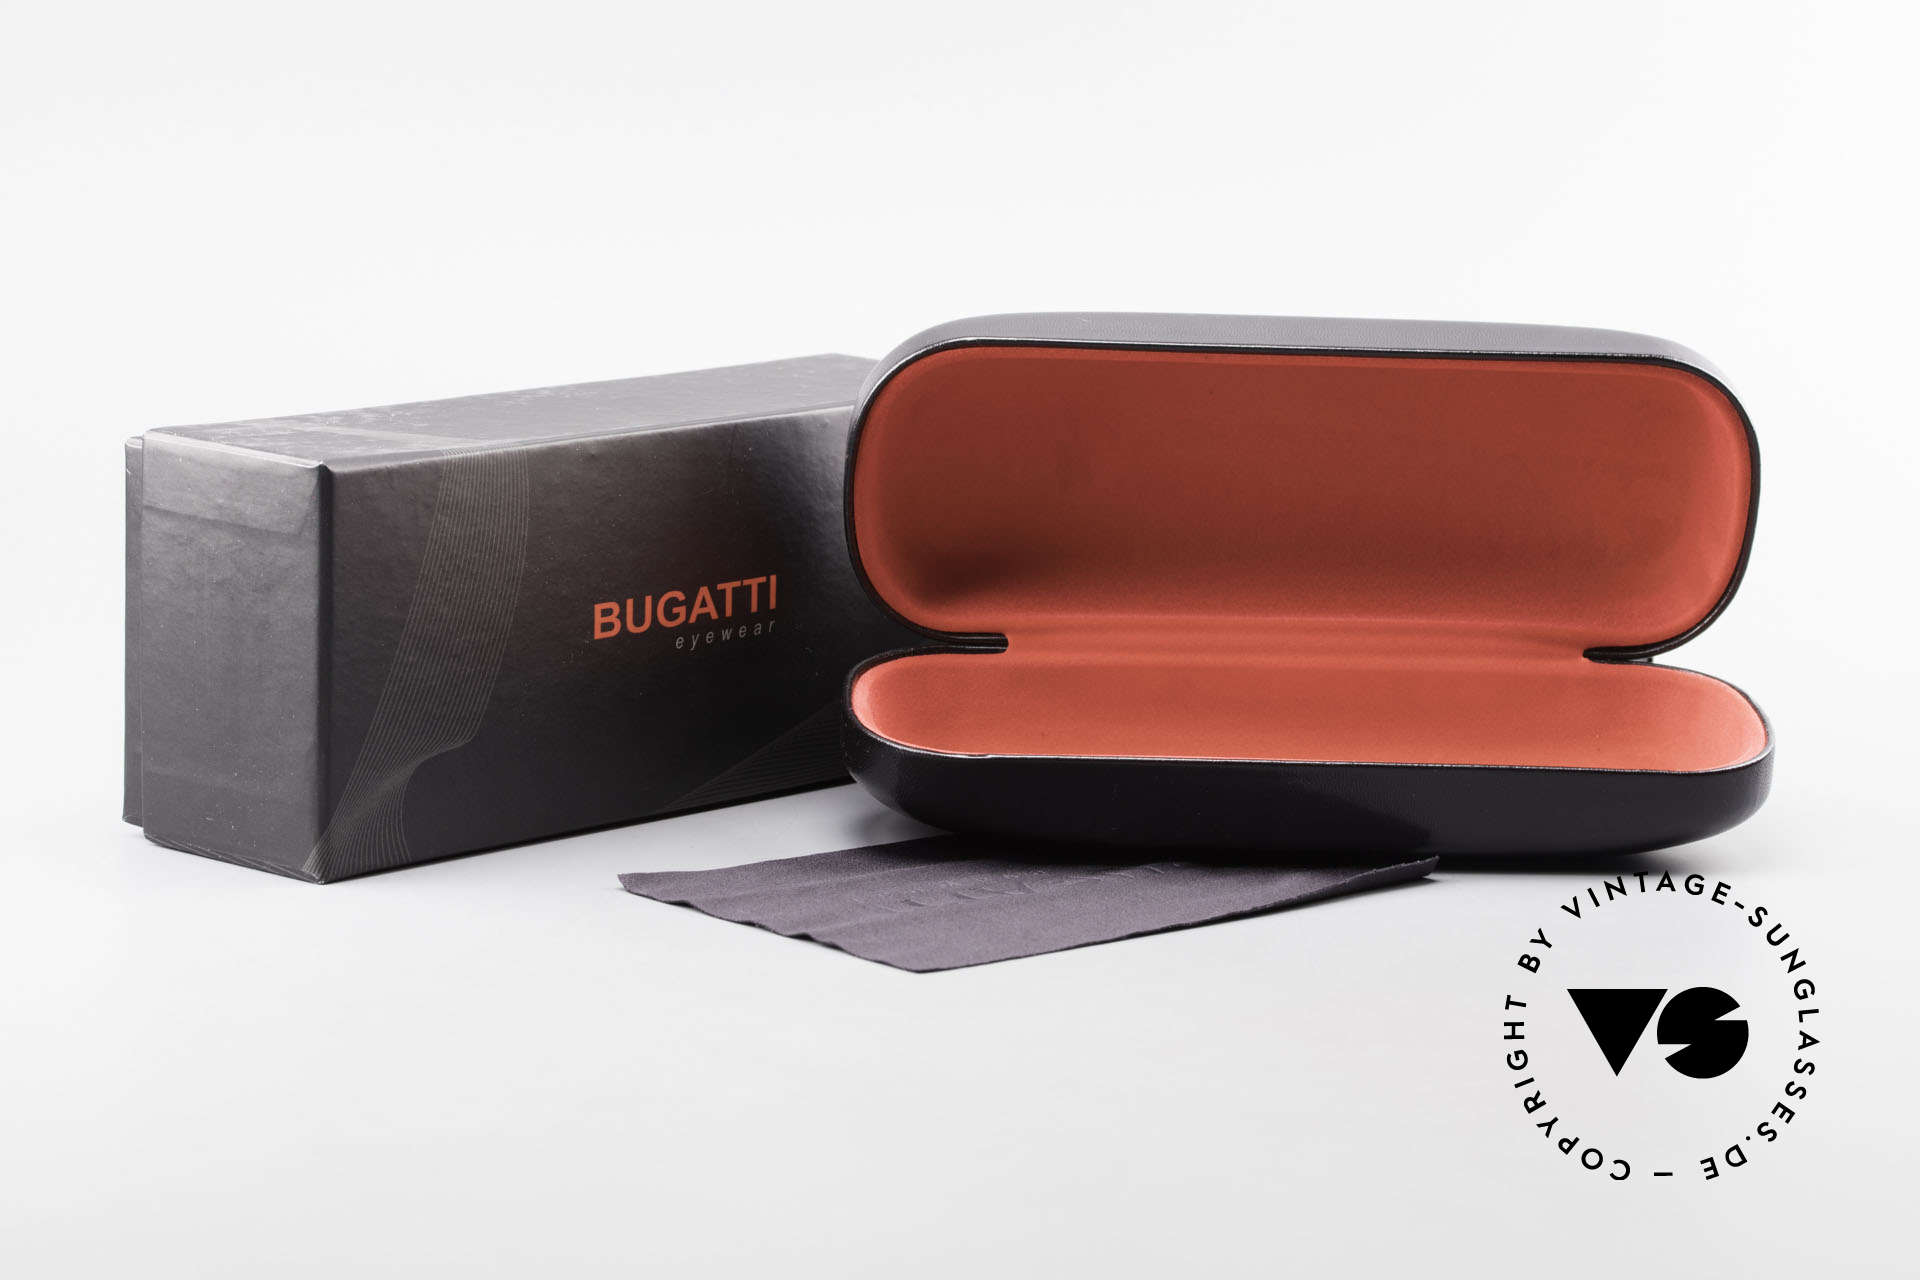 Bugatti 455 Titanium Frame Satin Palladium, Size: large, Made for Men